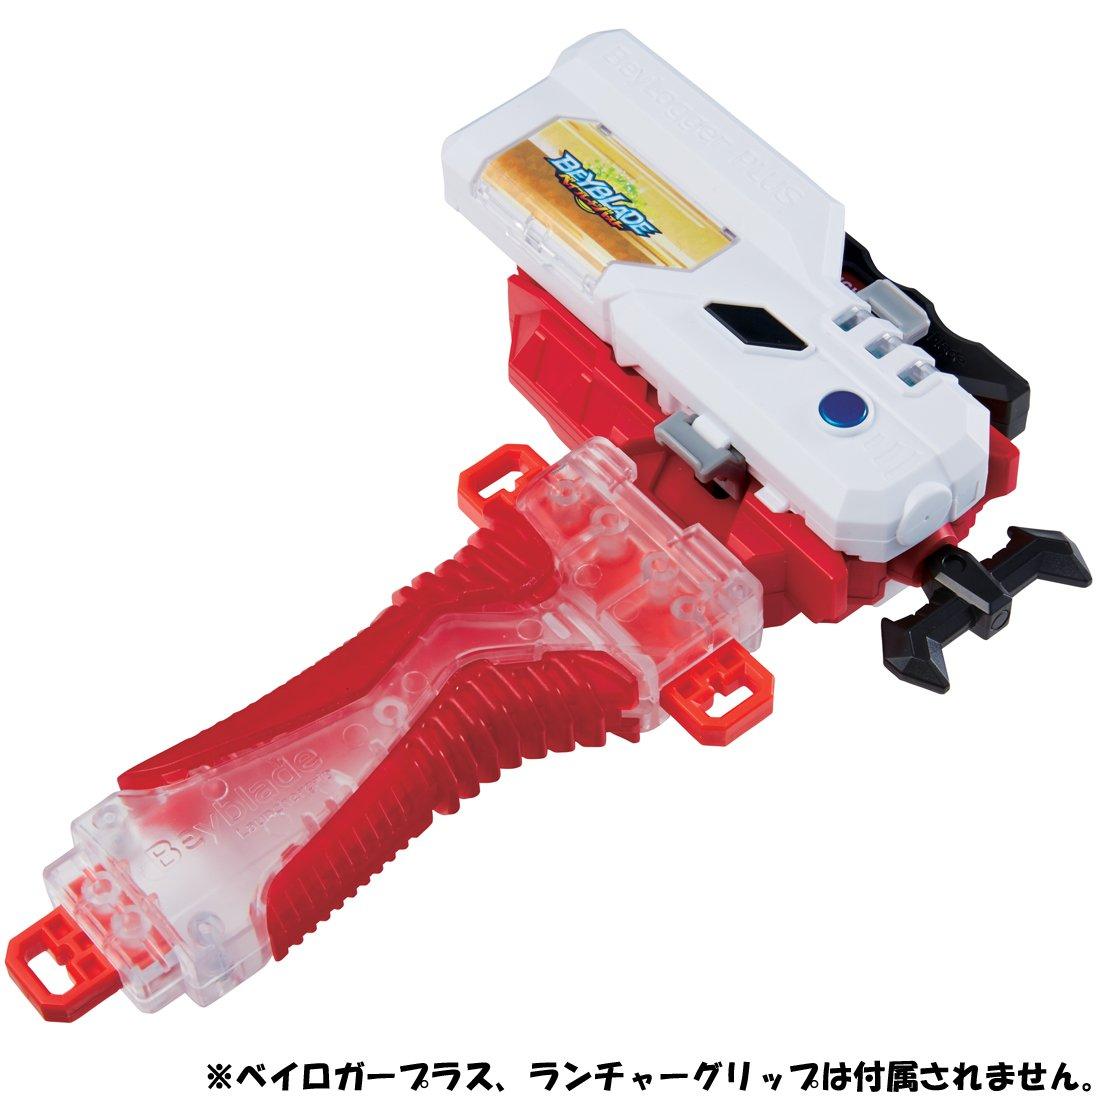 Japan Import Takara Tomy Beyblade Burst Bey Launcher LR B-88